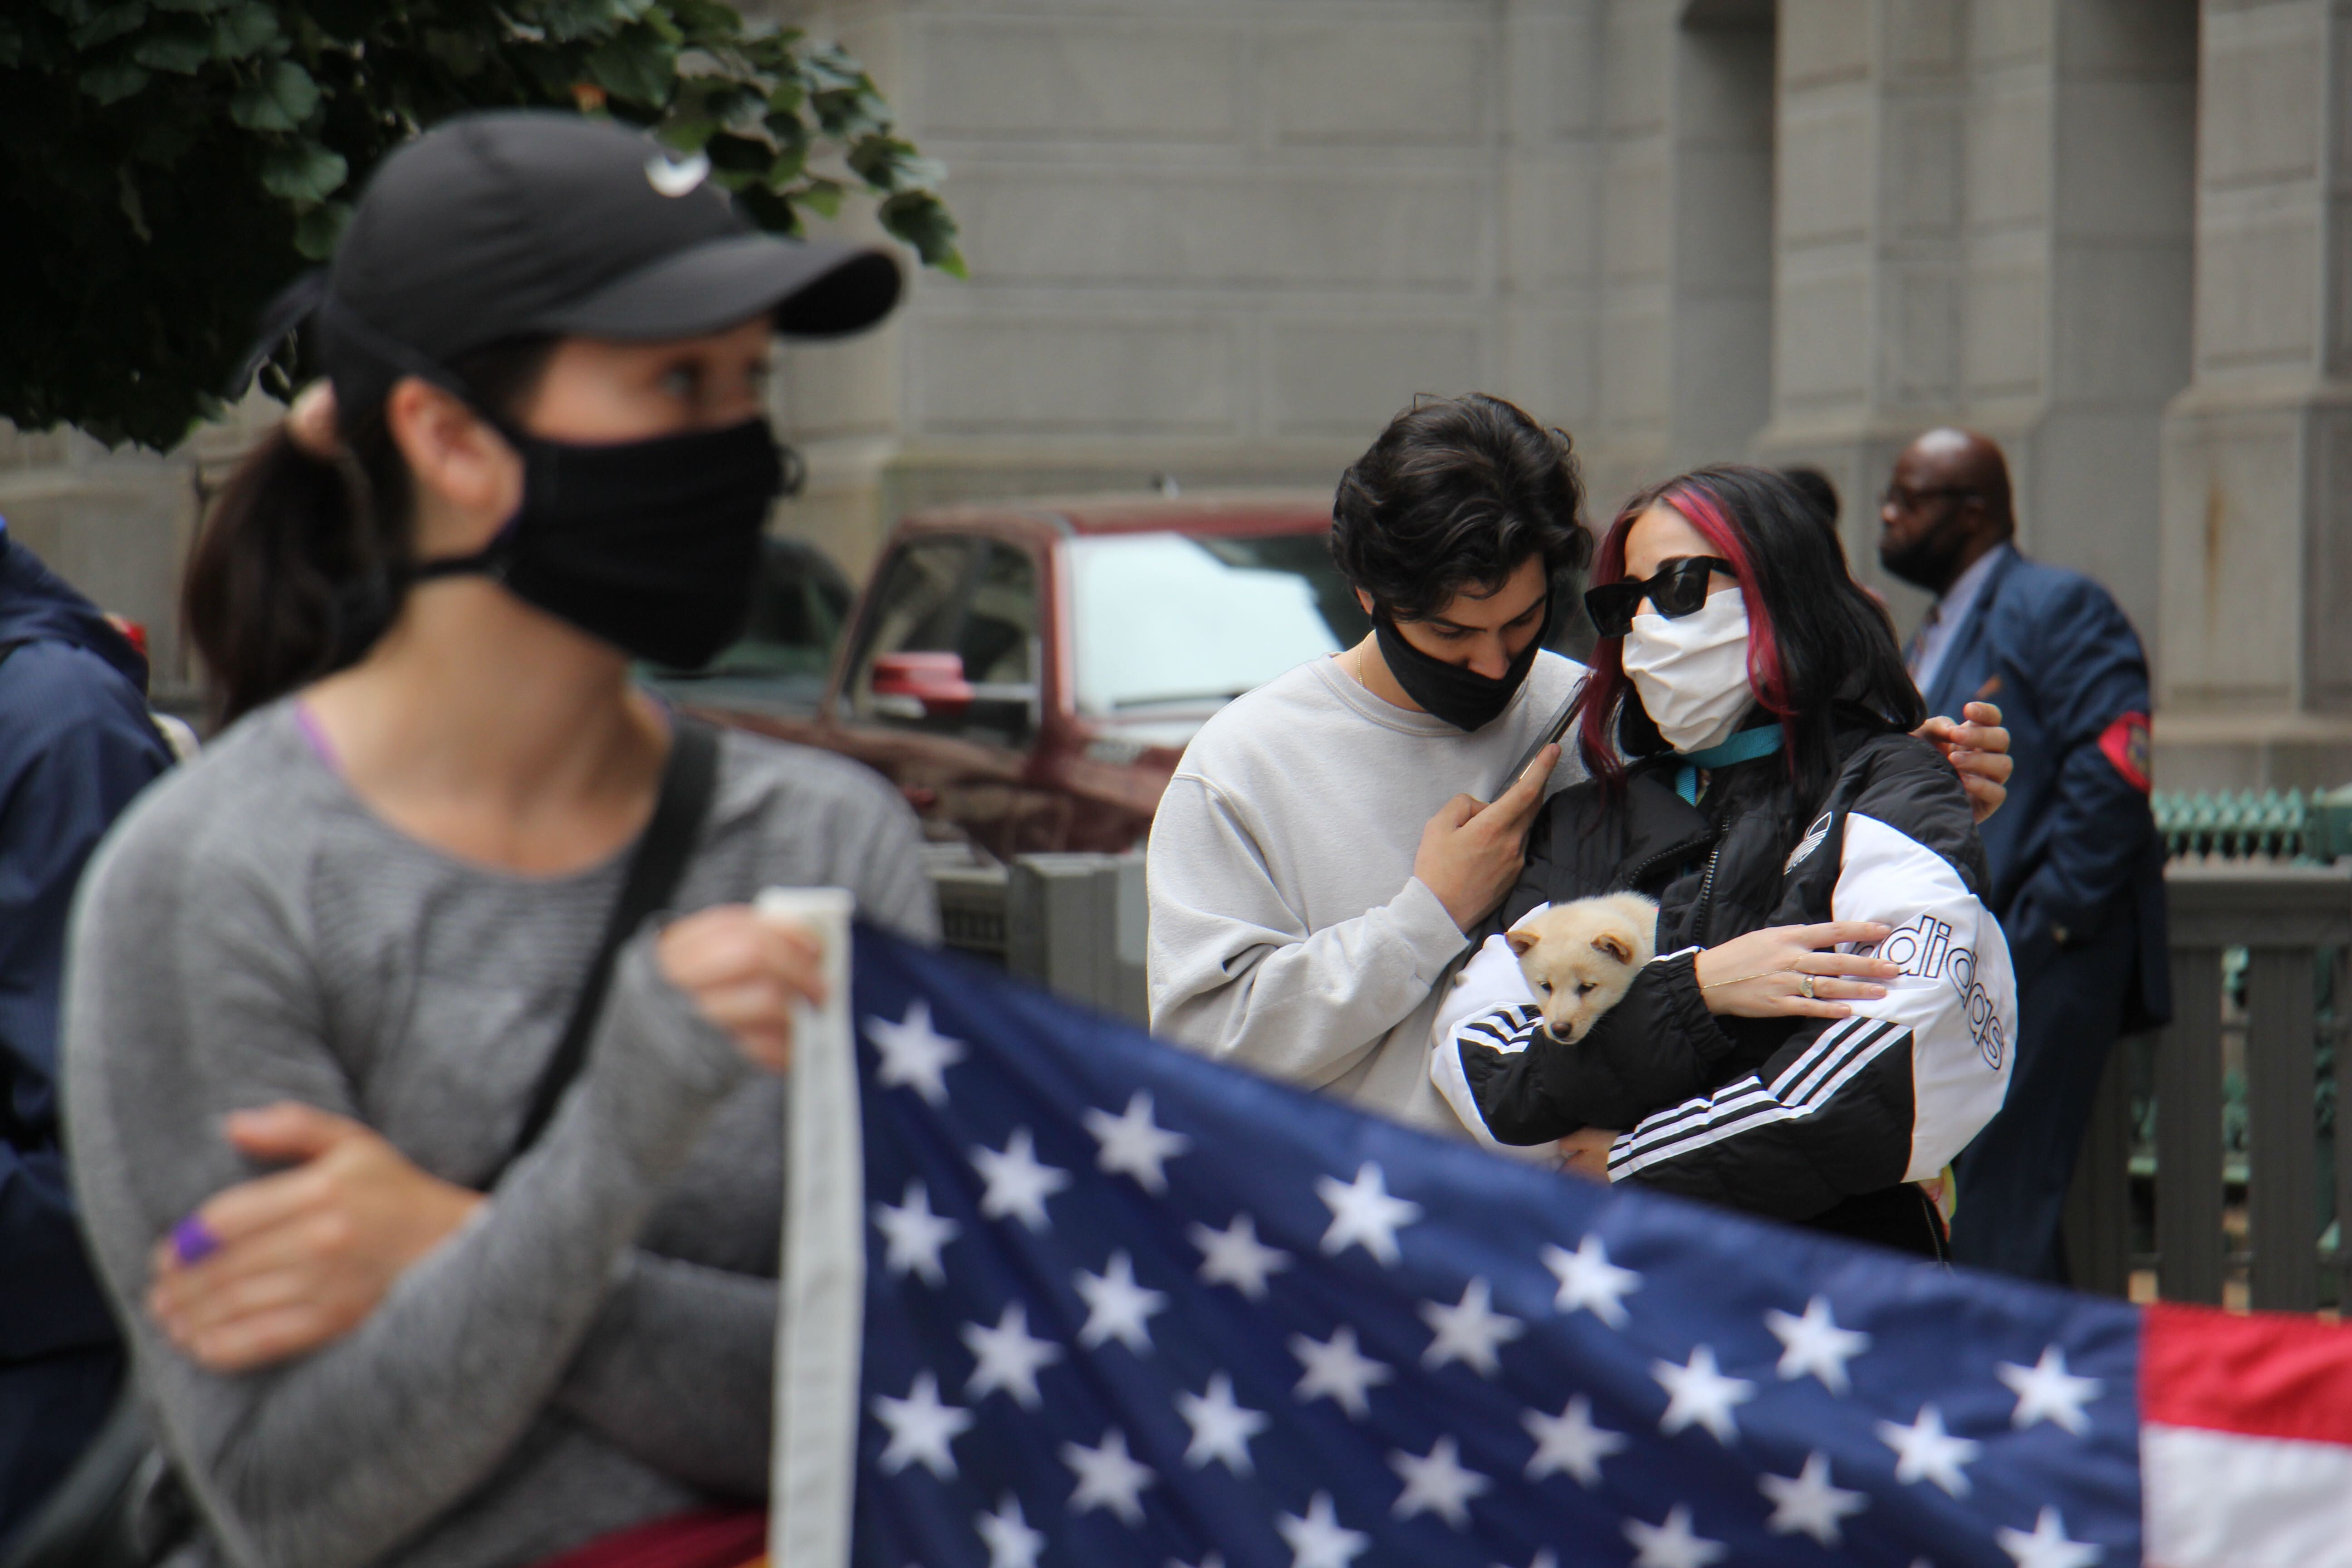 Cameron and Nina Fatholahi of Philadelphia listen to Joe Biden's speech outside City Hall, while Nina cradles an 8-week-old puppy, Penny Lane.